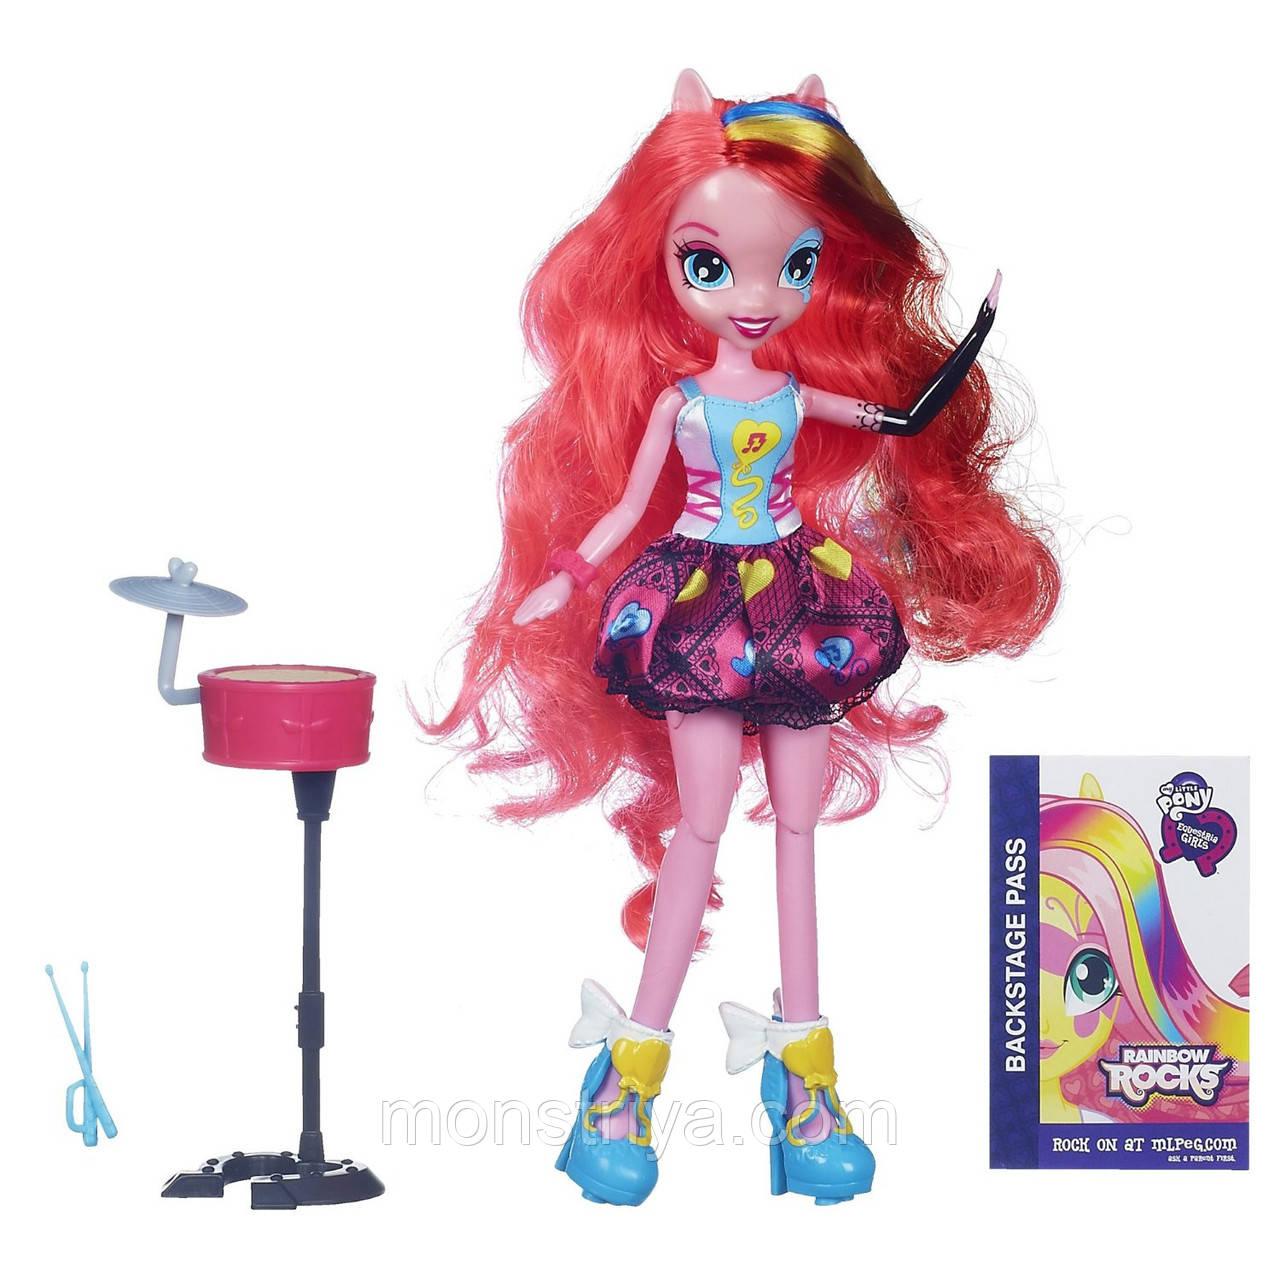 Кукла My Little Pony Equestria Girls ПОЕТ ,ГОВОРИТ !  Рок-звезда Пинки Пай.Киев